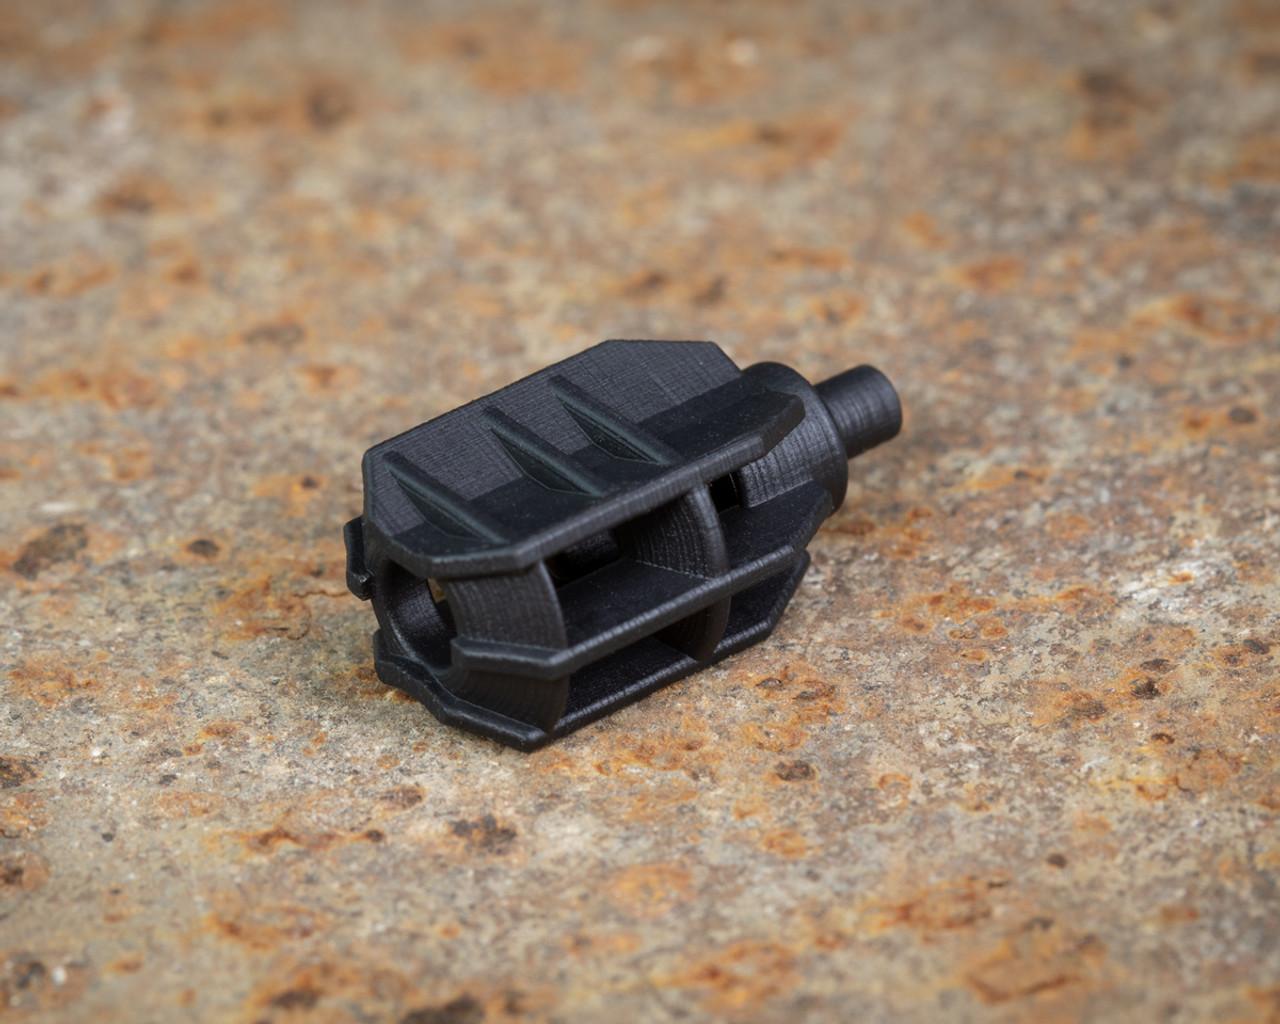 M51 Super Sherman - Muzzle Brake